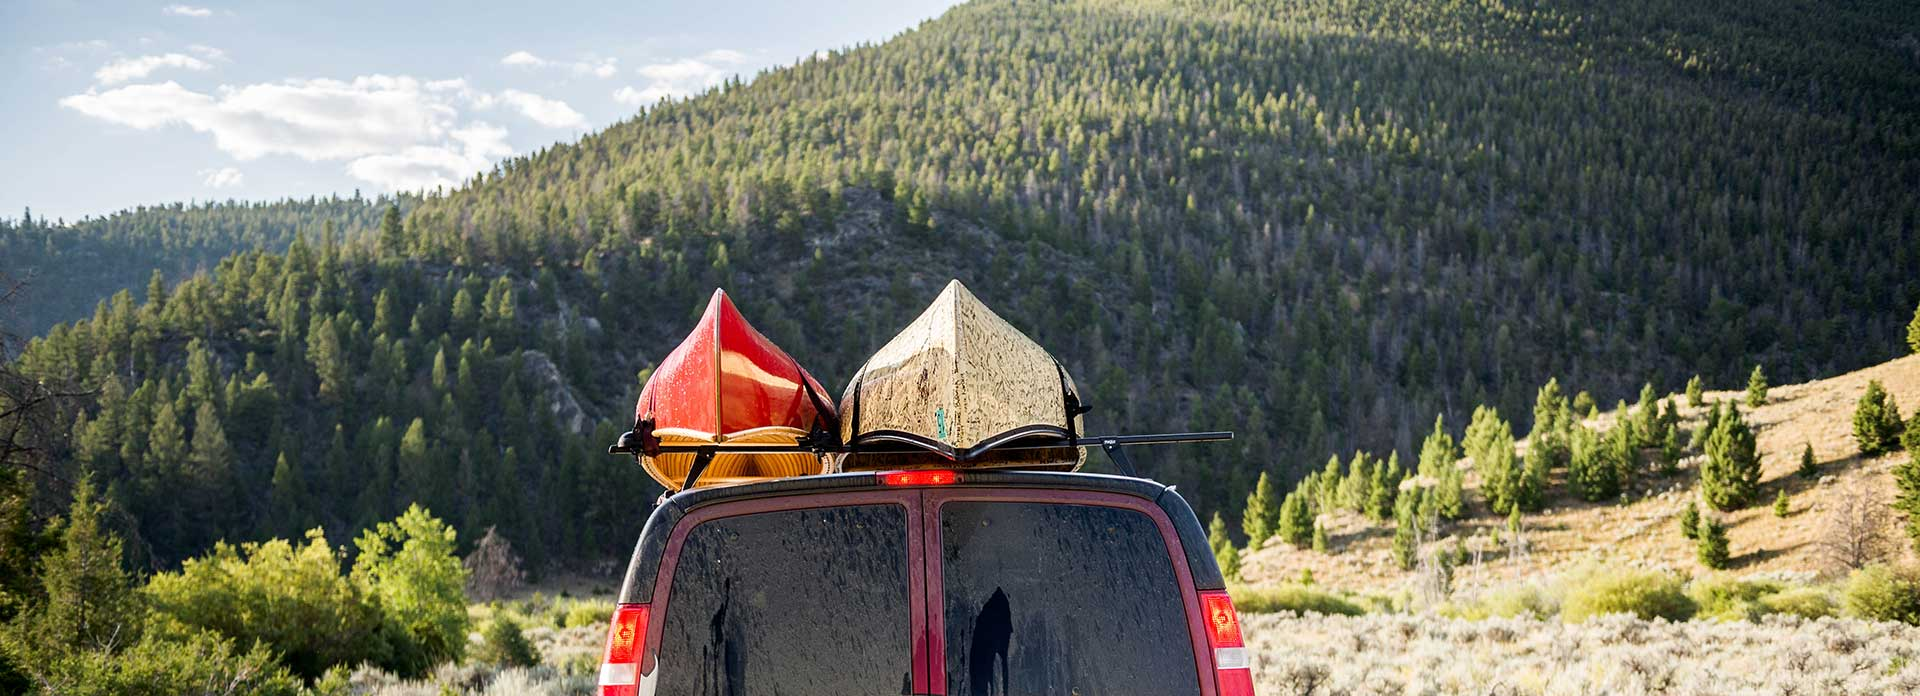 Start Planning a Road Trip